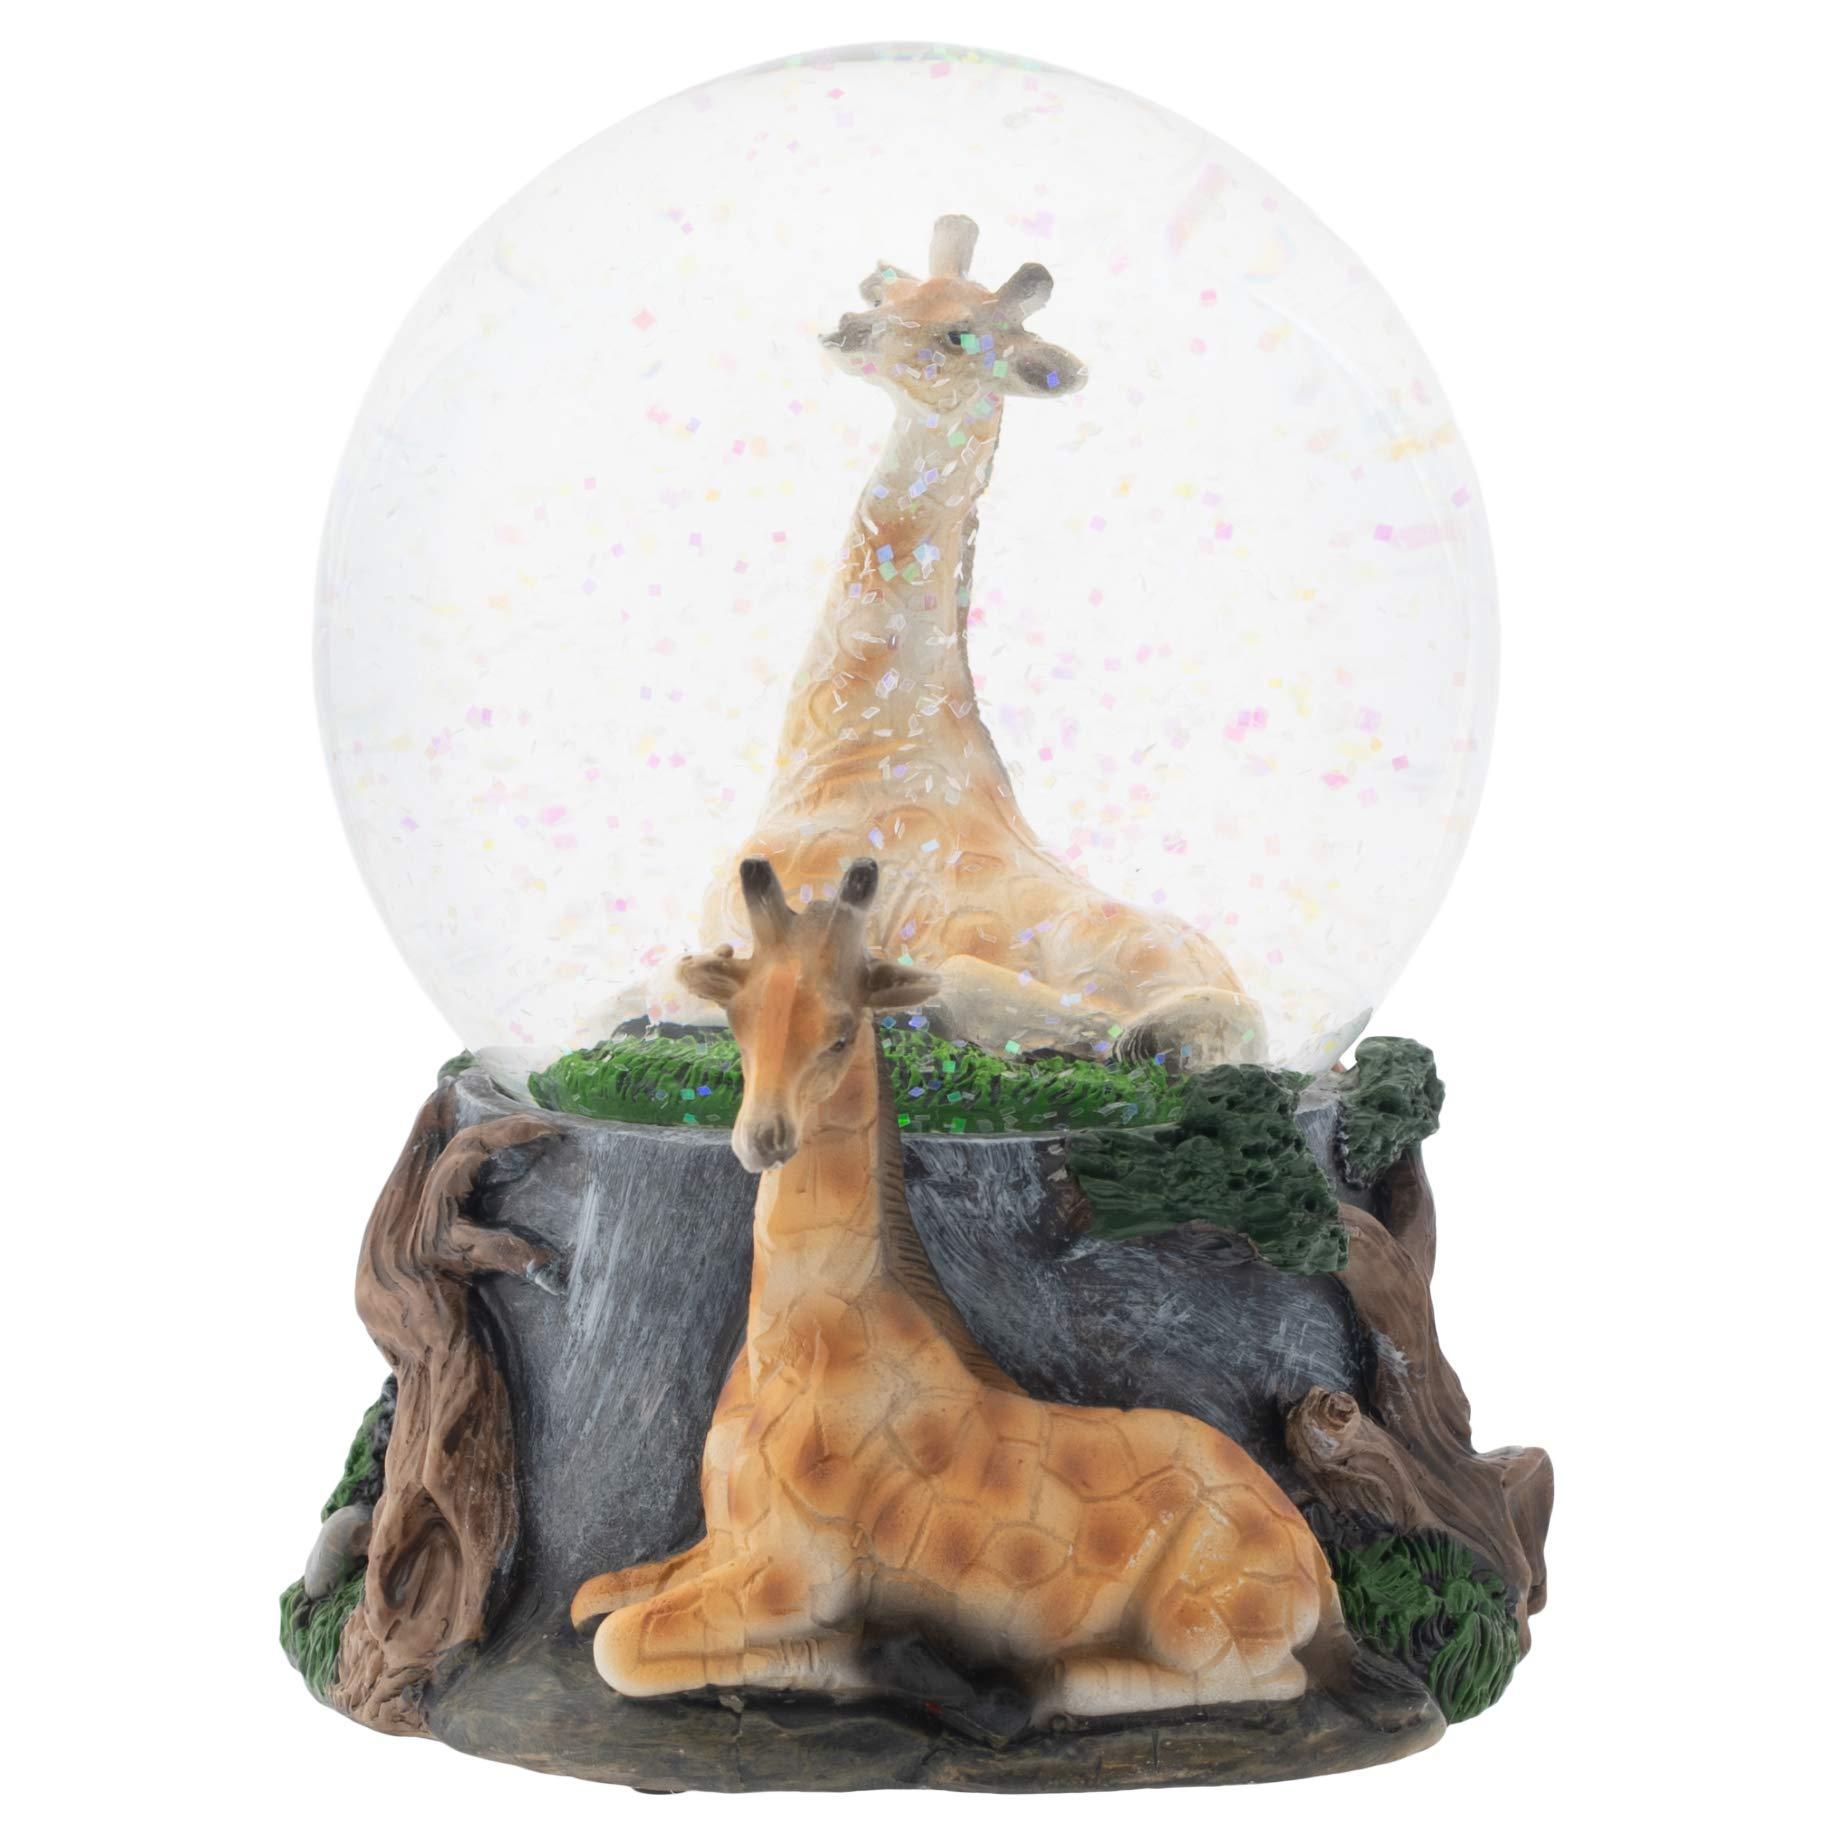 Image of Beautiful Born Free Musical Giraffe Water Globe